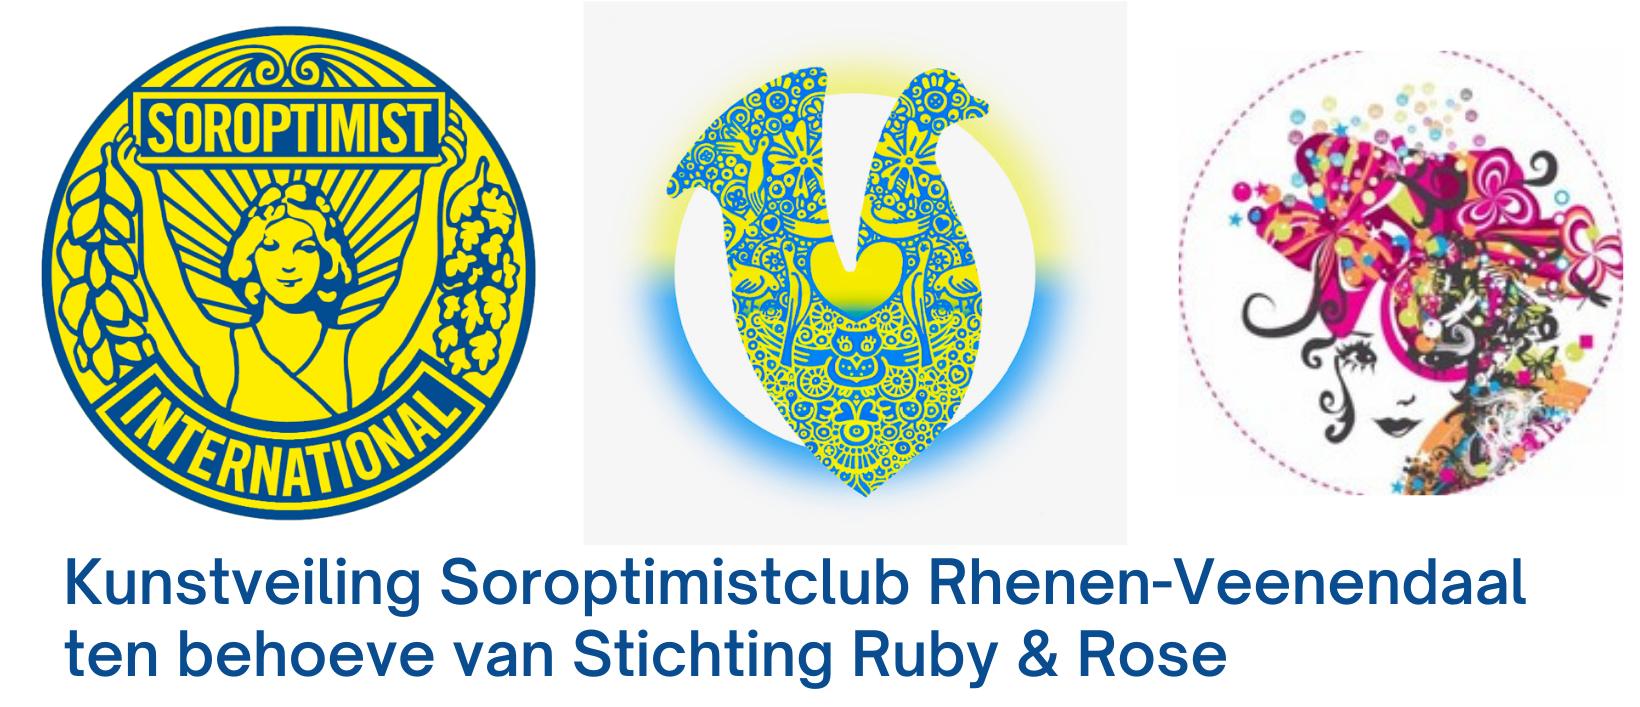 Kunstveiling Soroptimistclub Rhenen Veenendaal